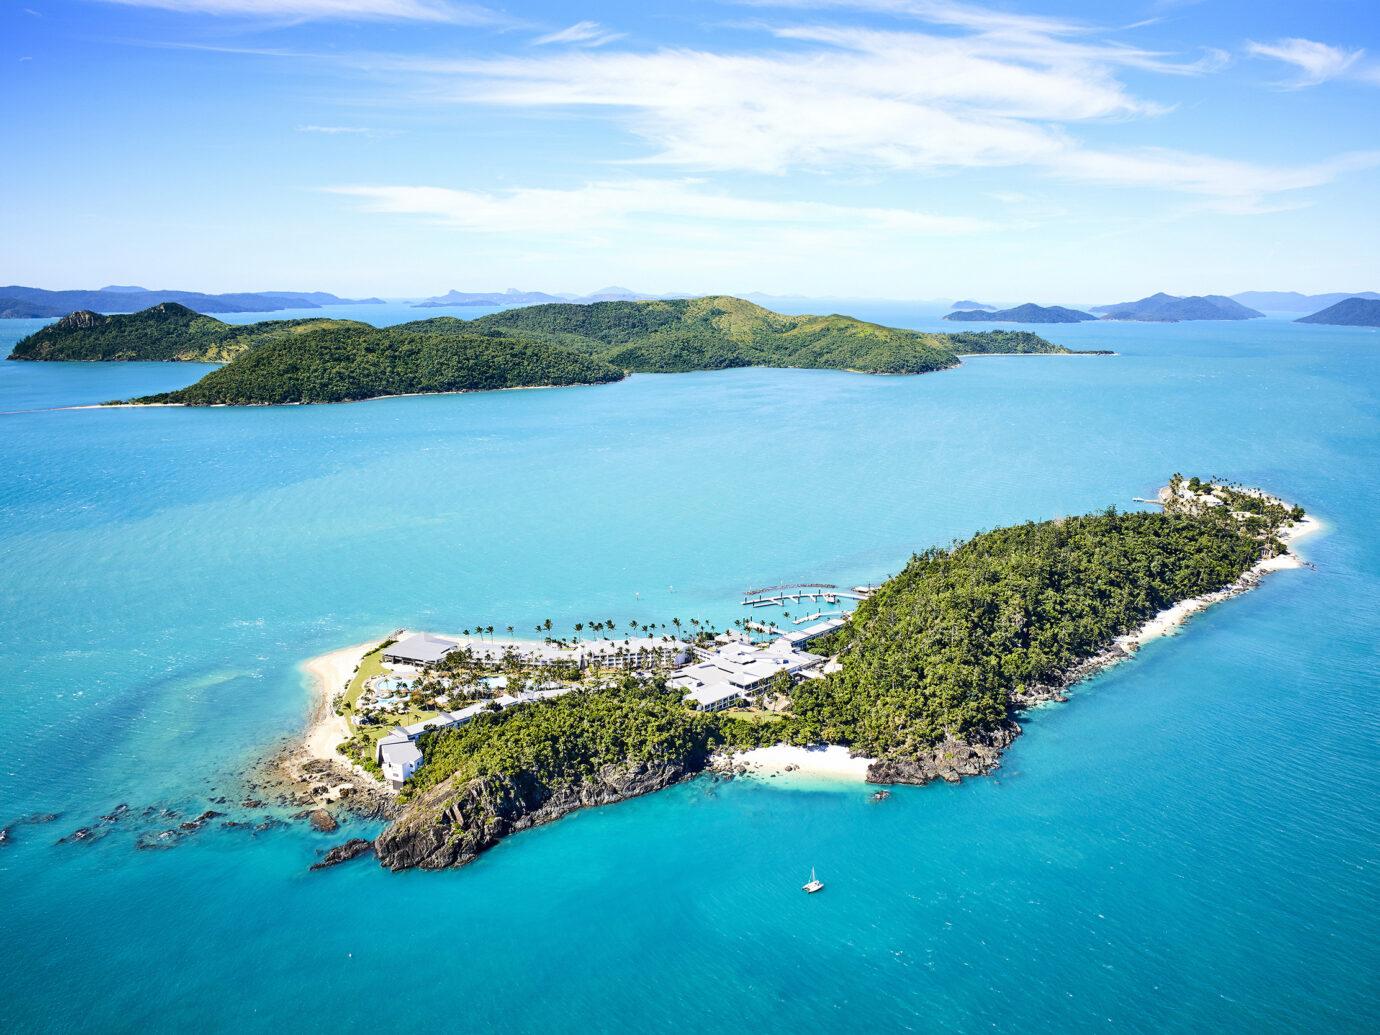 Ariel view of Daydream Island